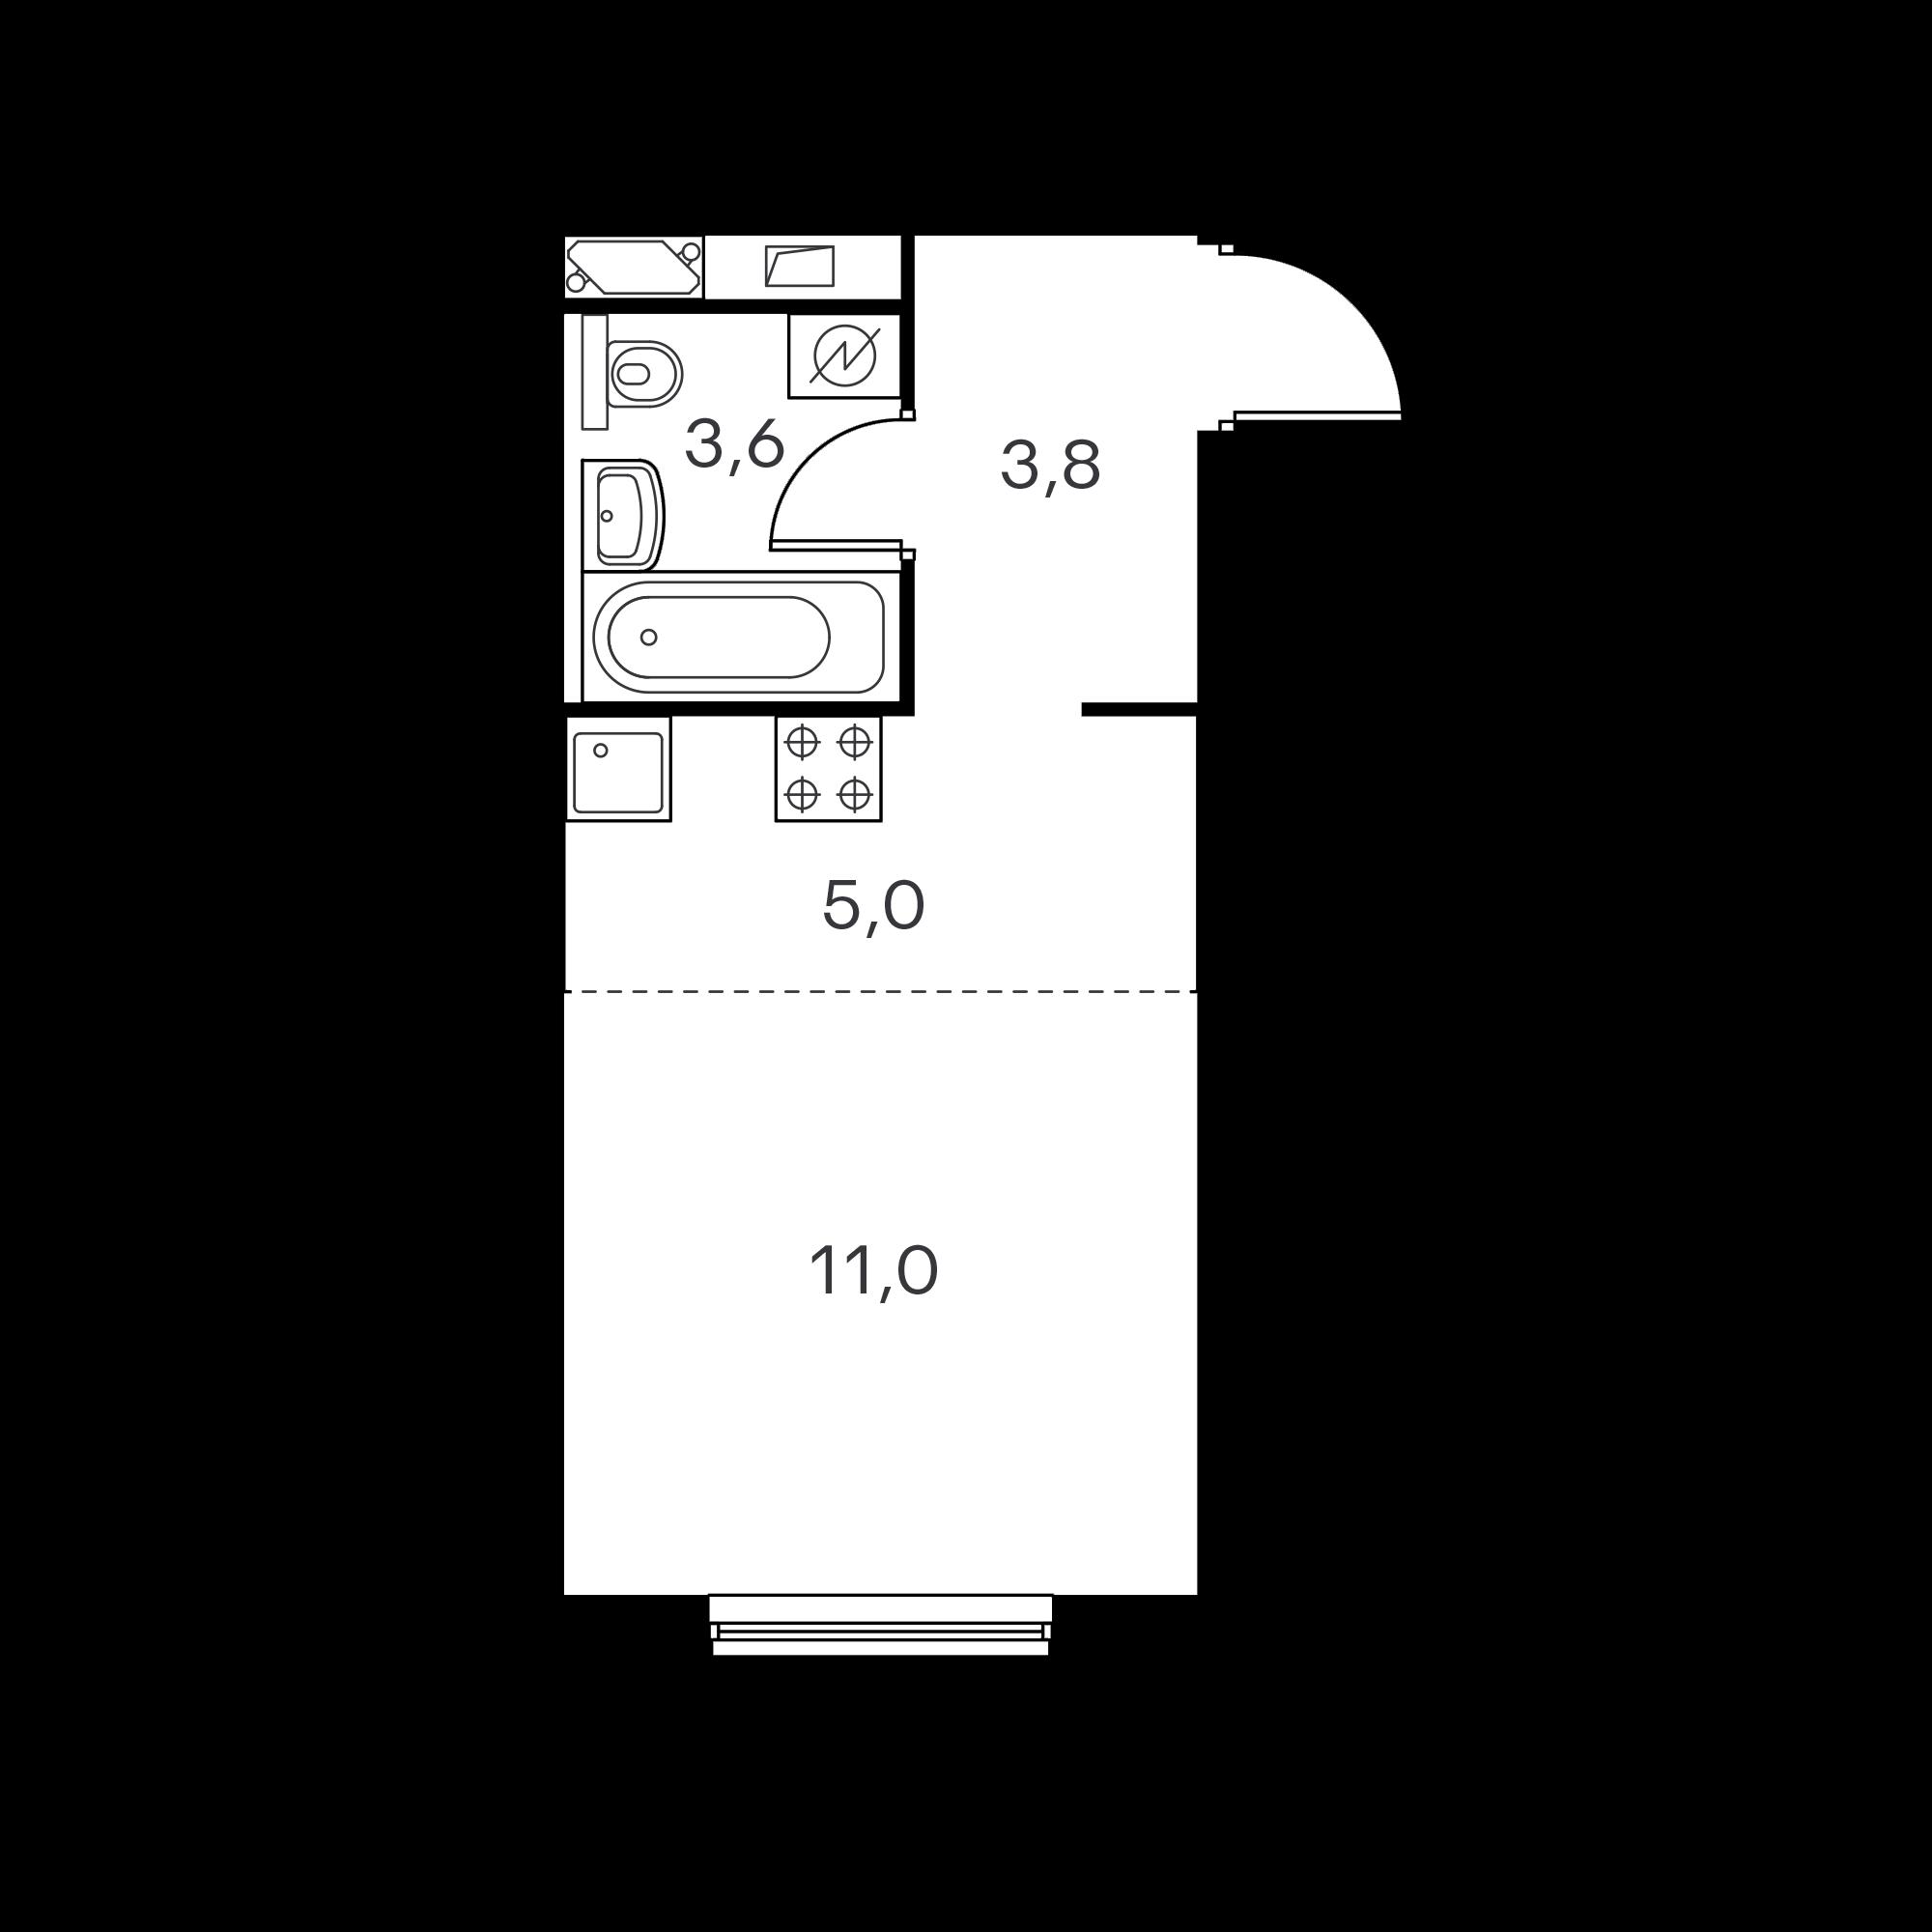 1NS2_5